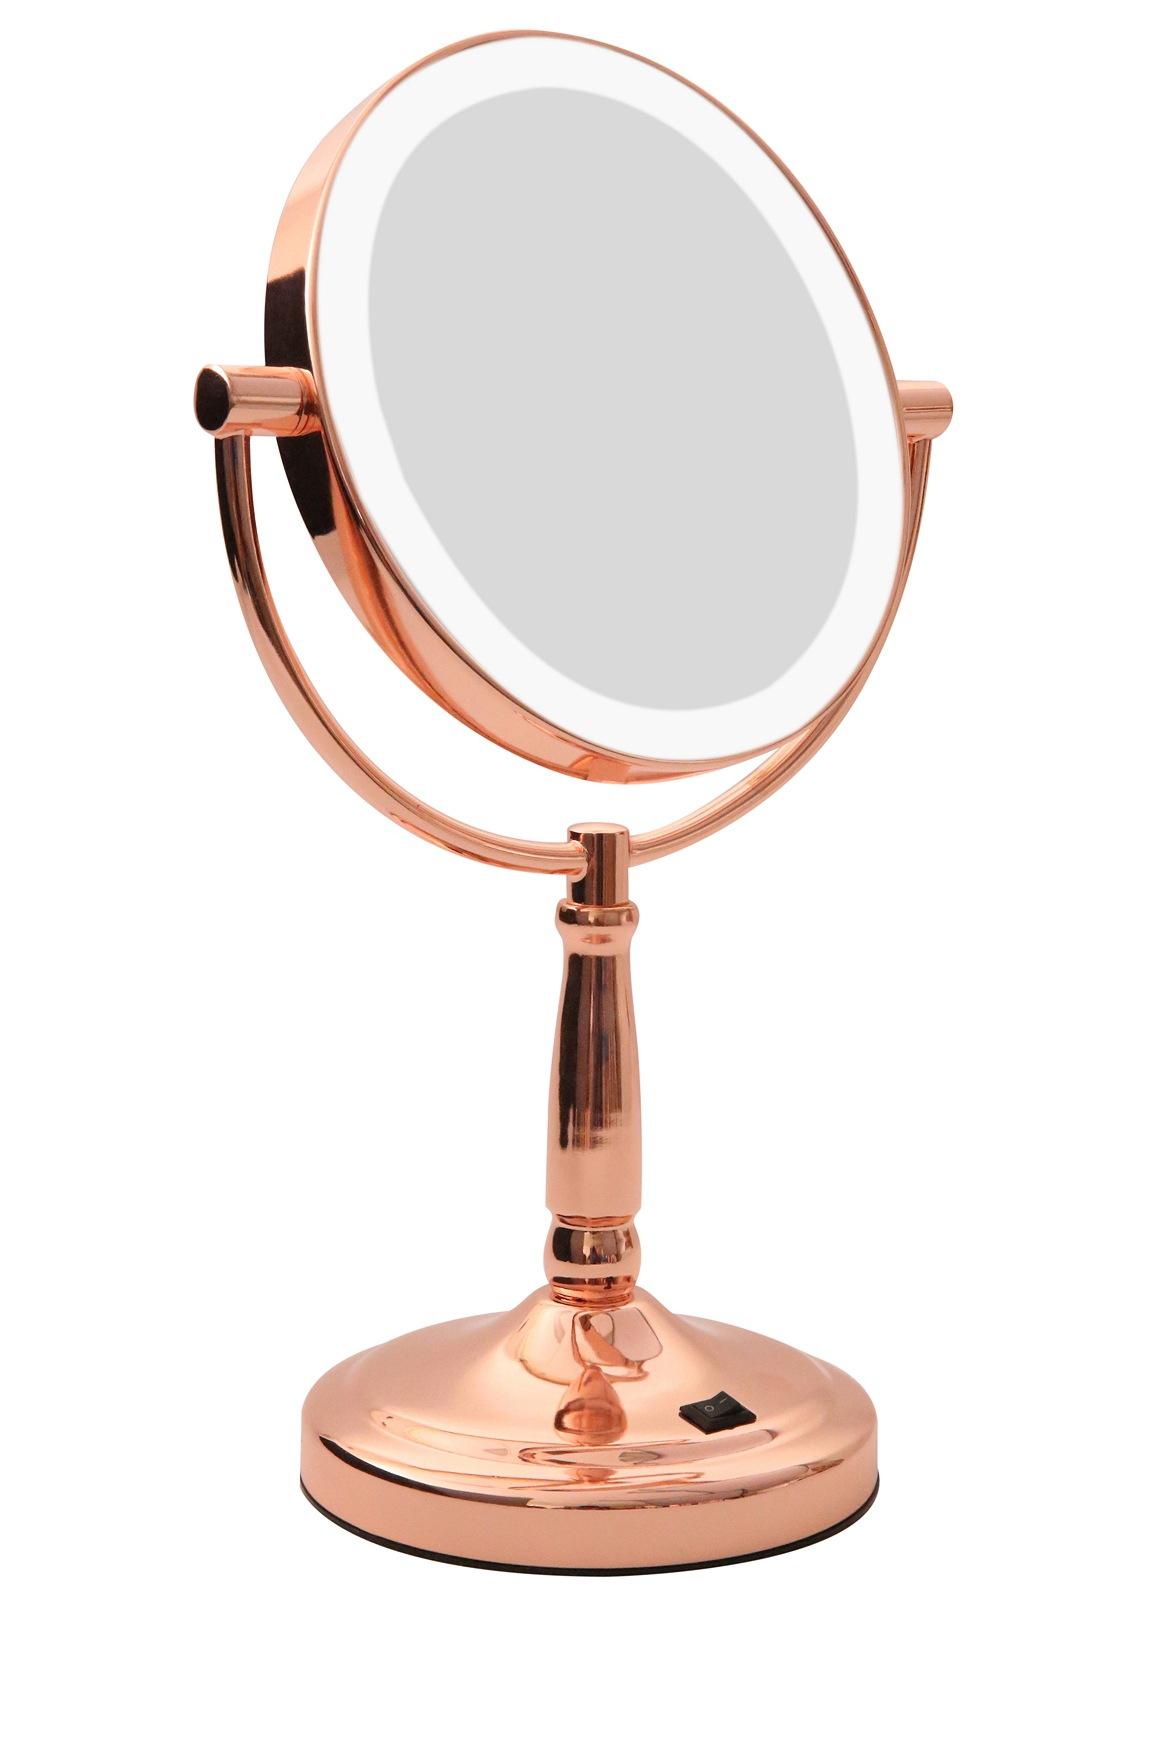 Homedics   LED Vanity mirror Rose Gold   Myer Online